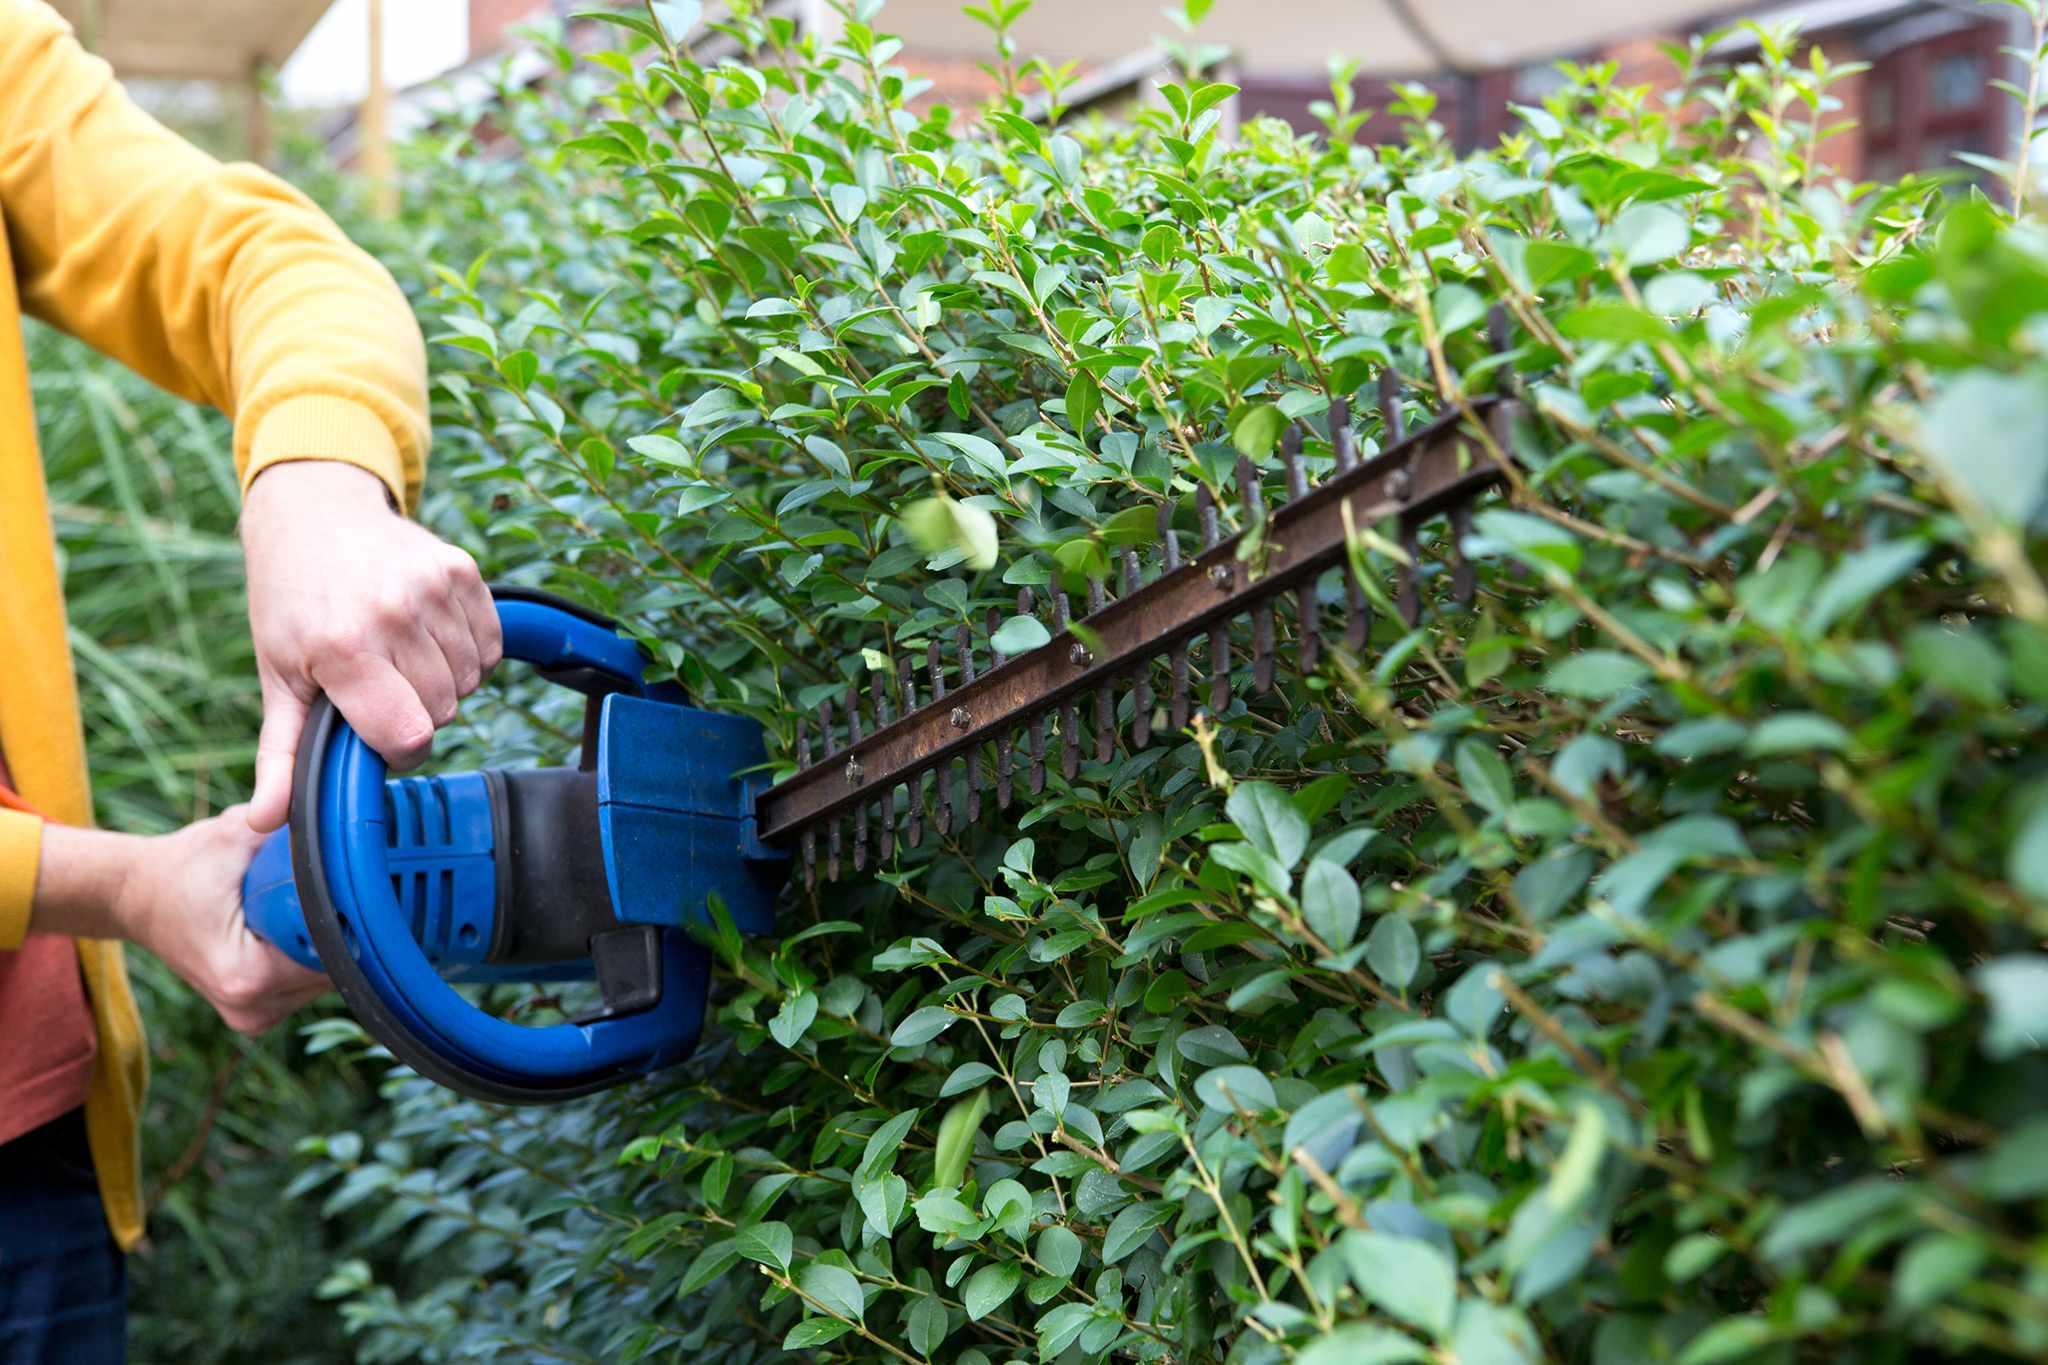 Trimming a privet hedge